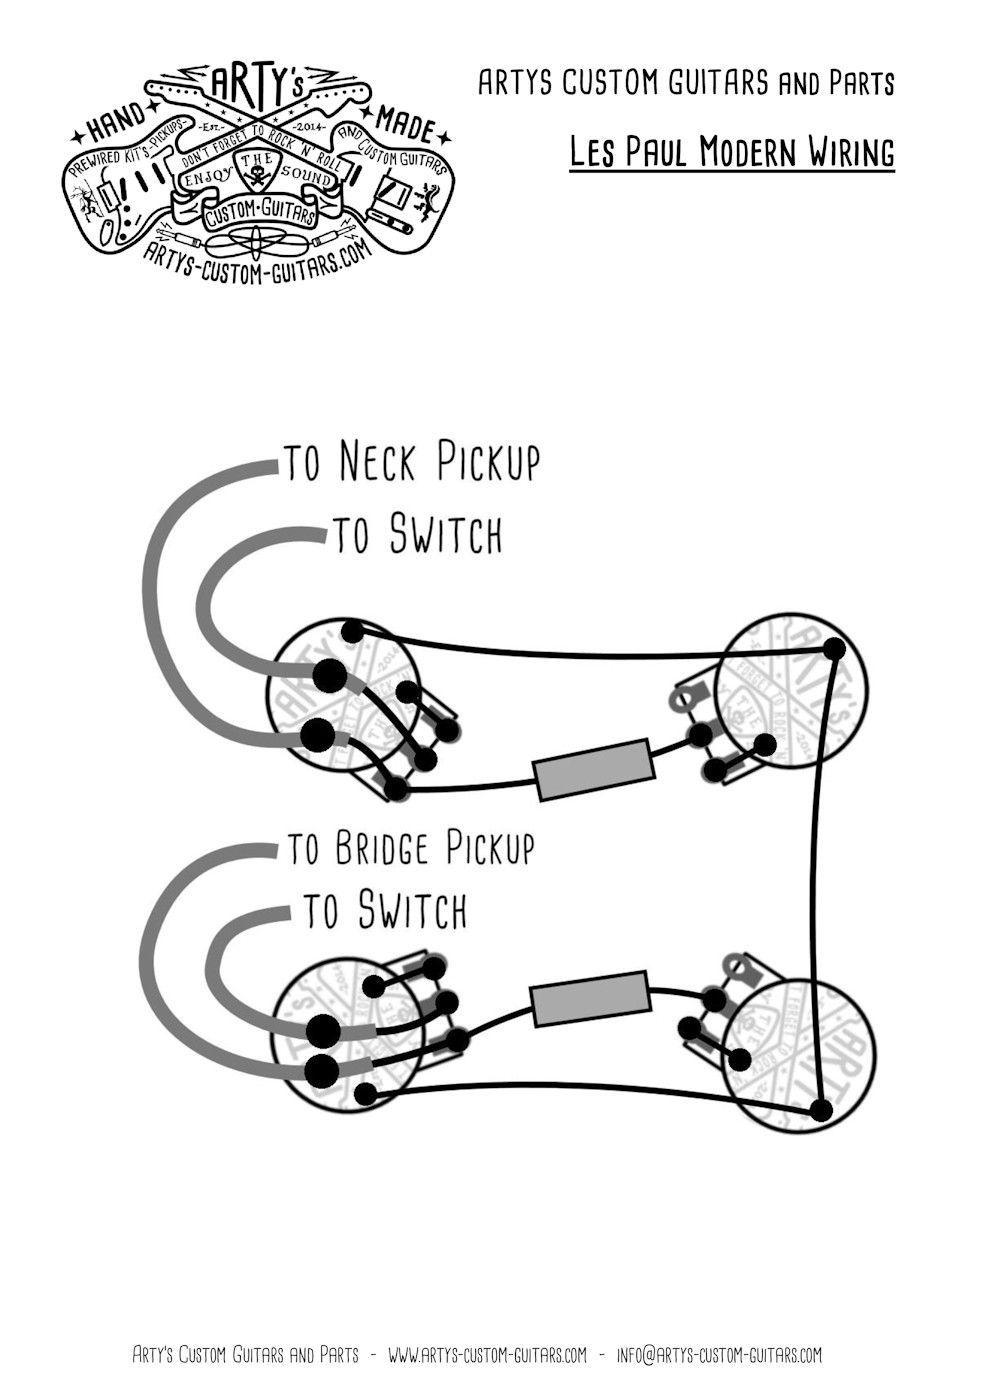 arty s custom guitars wiring diagram plan les paul assembly harness [ 990 x 1400 Pixel ]